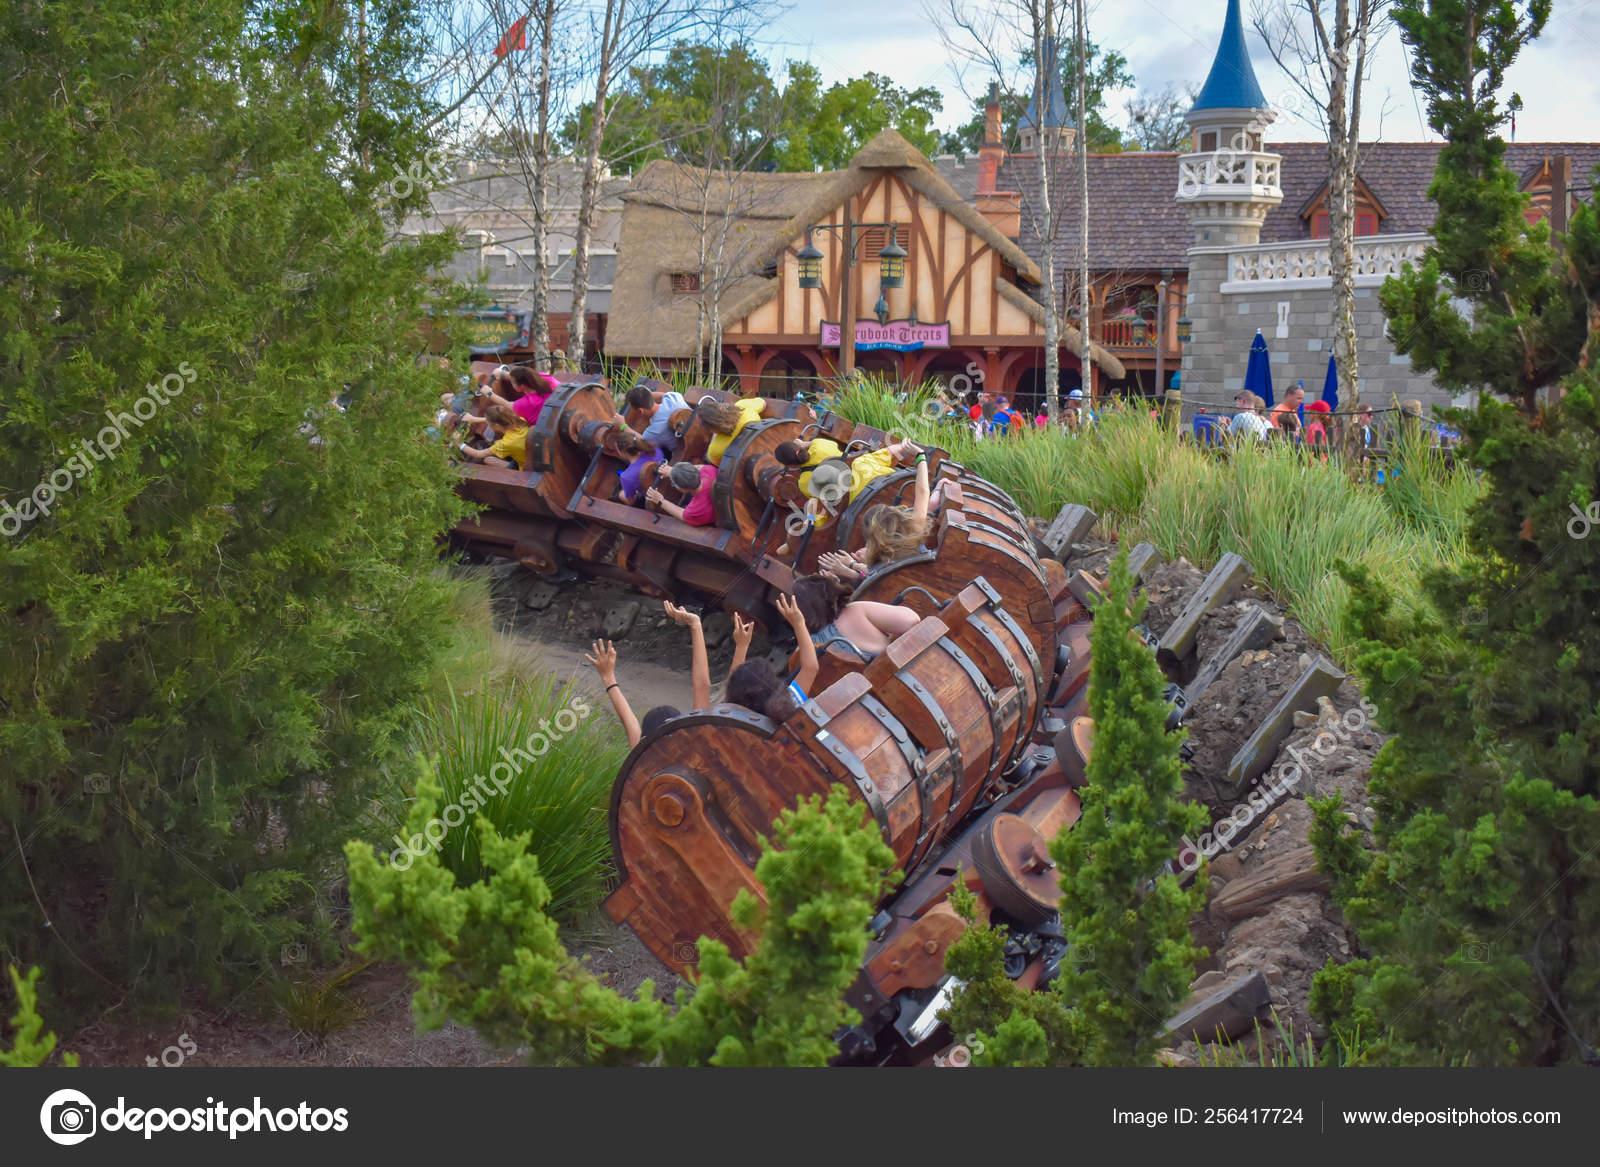 Orlando Florida March 2019 People Enjoying Seven Dwarf Mine